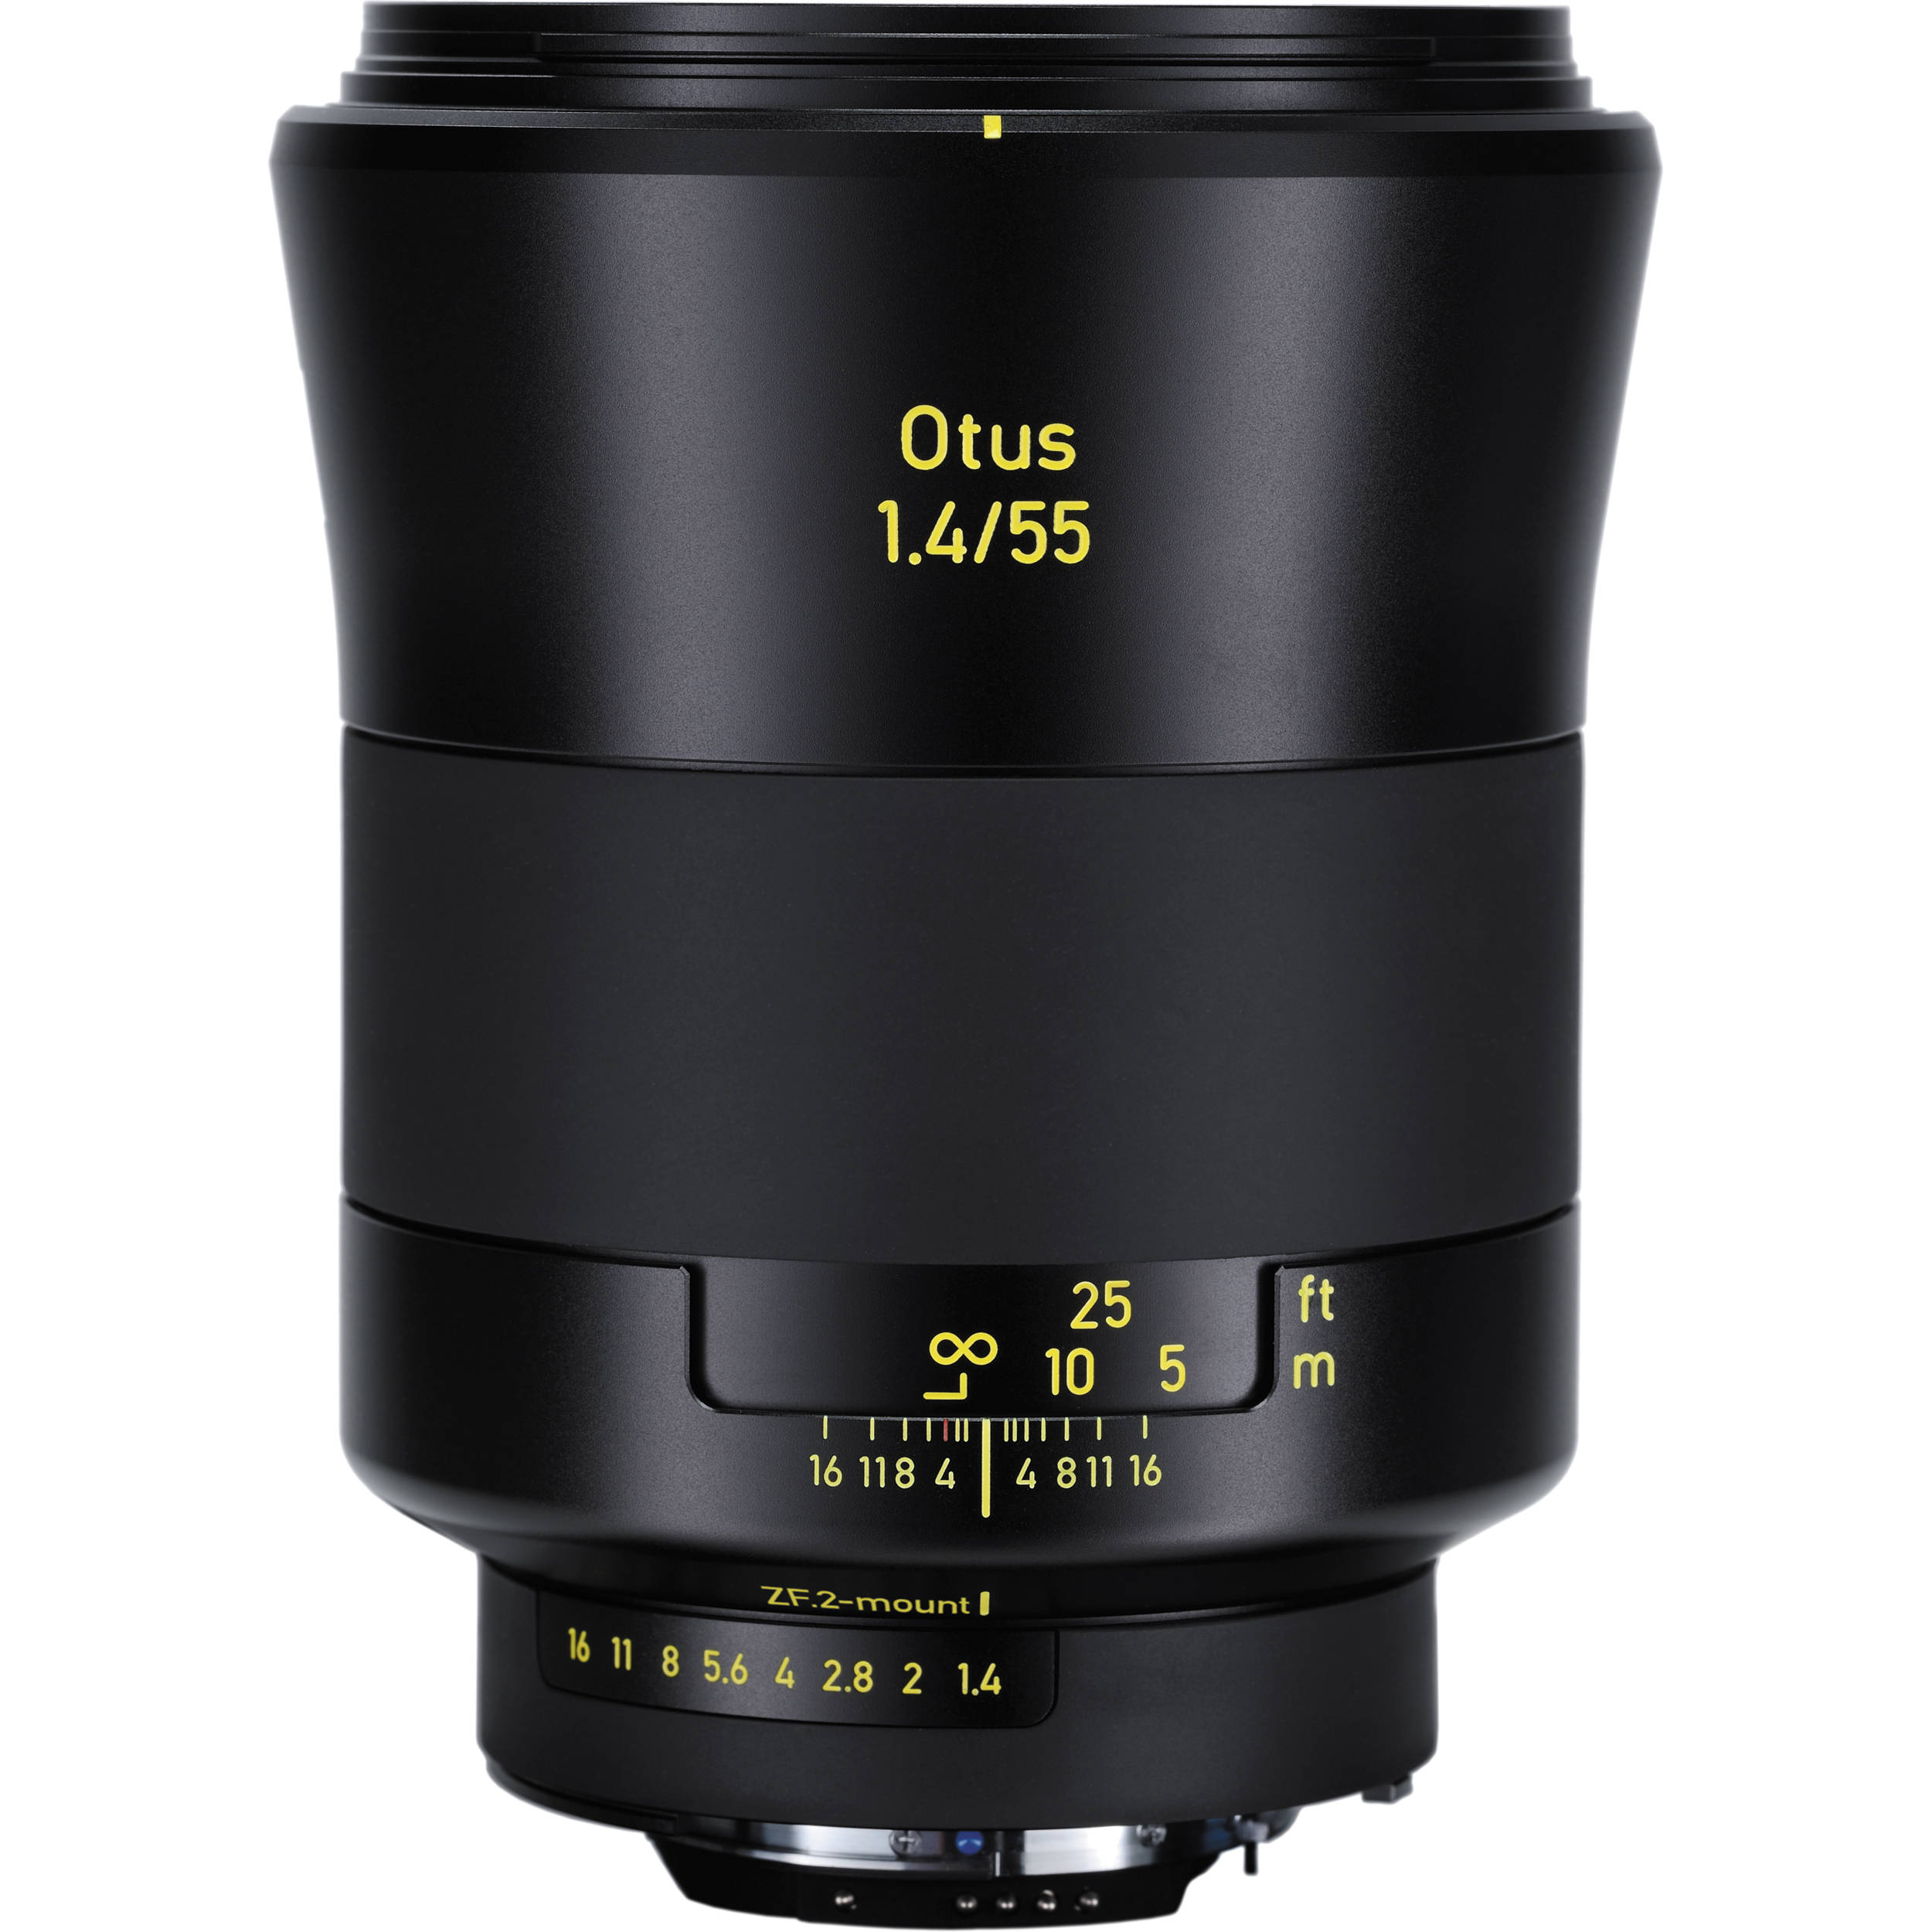 ZEISS Otus 55mm f/1 4 ZF 2 Lens for Nikon F